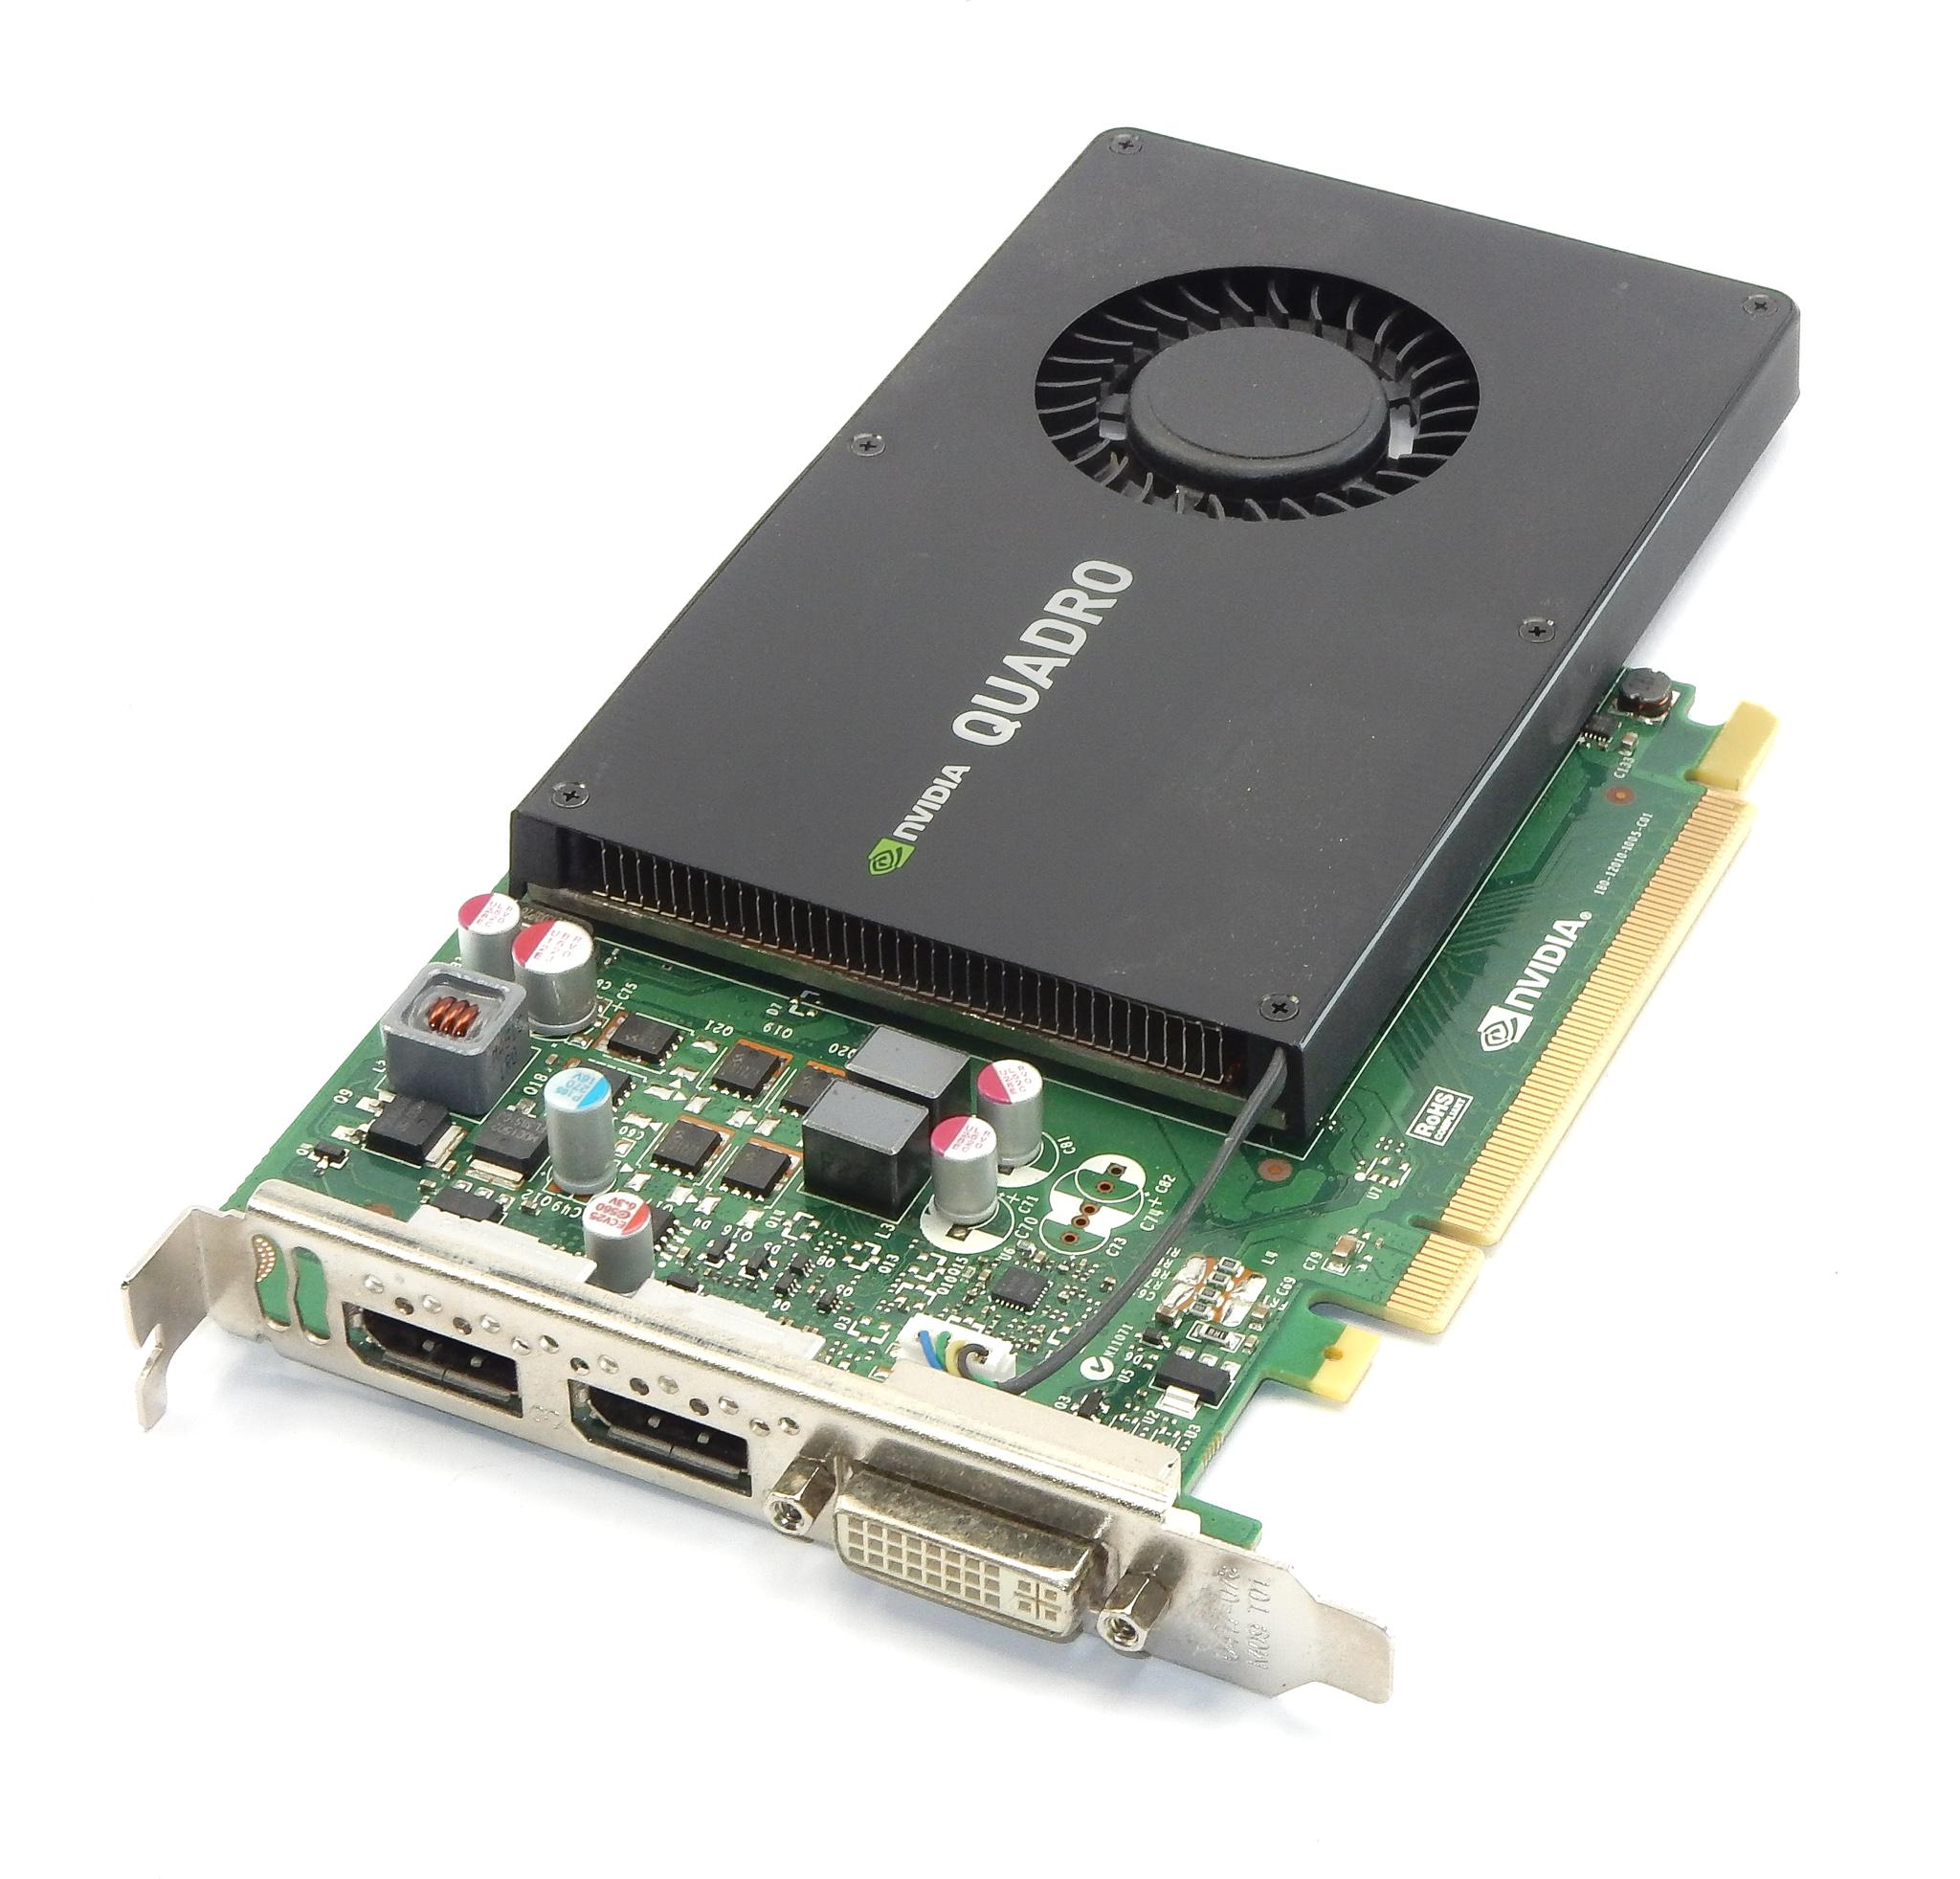 HP 765148-001 nVidia Quadro K2200 4GB GDDR5 PCIe Graphics Card